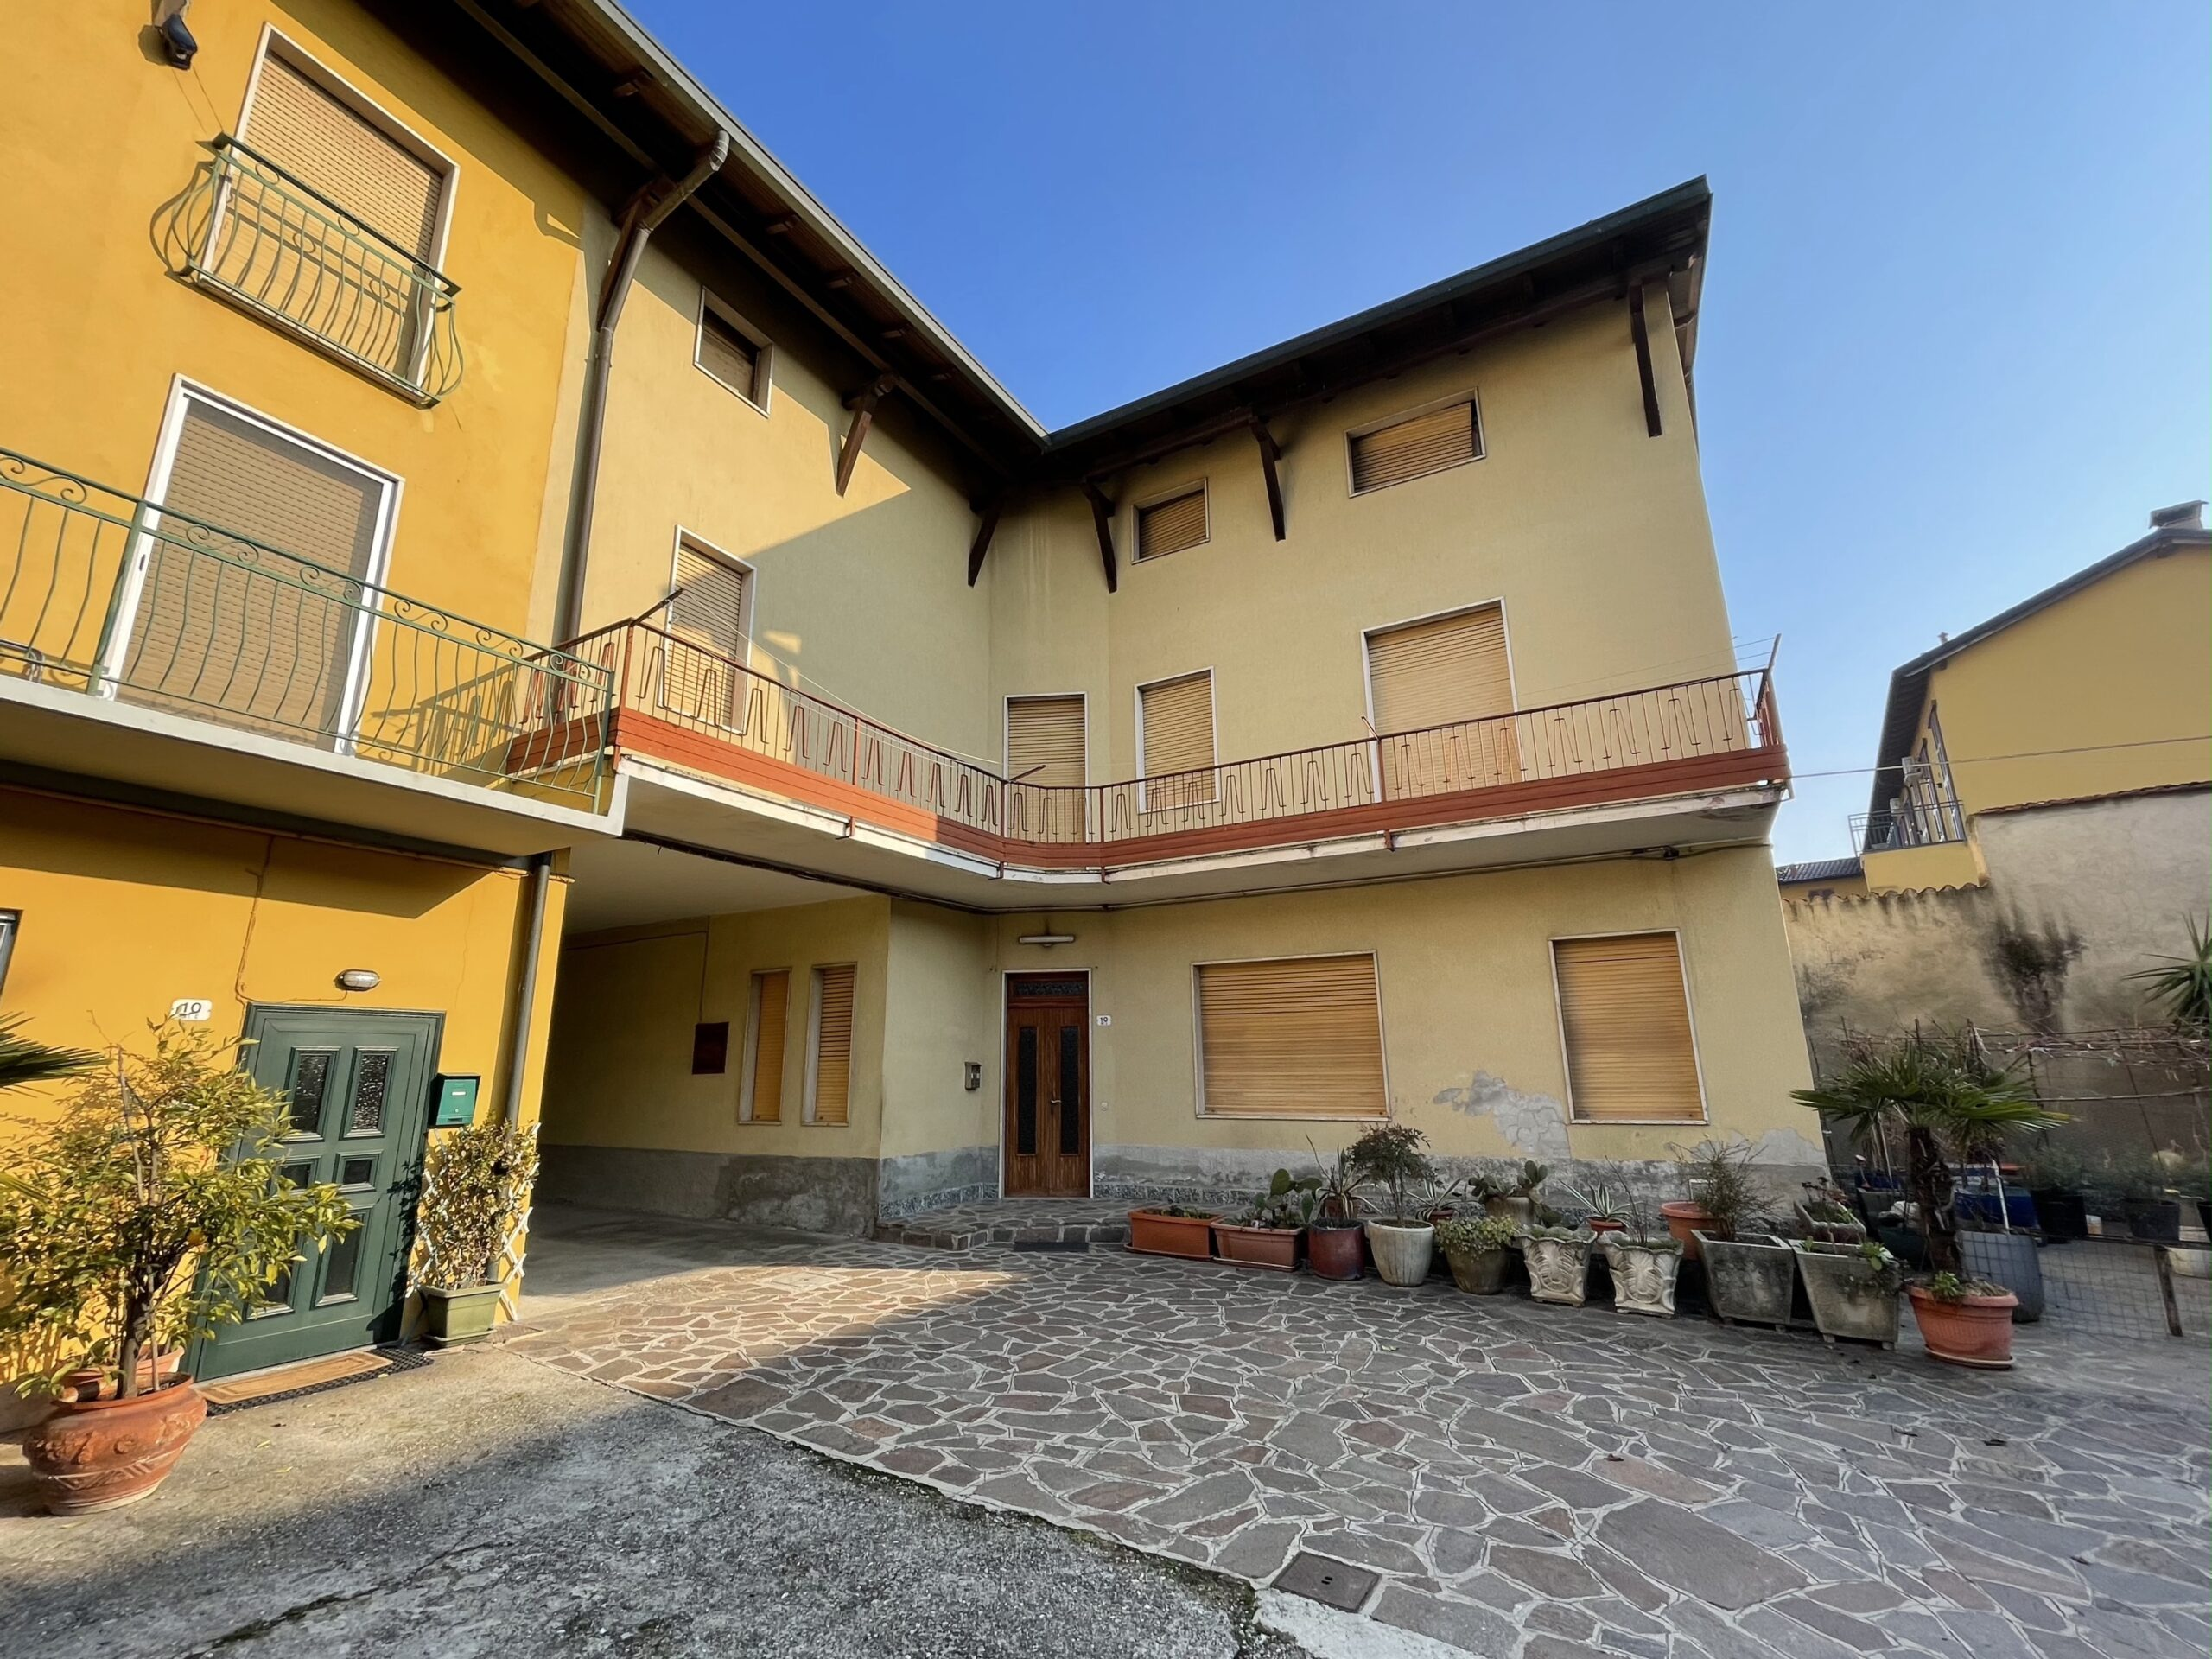 Casa indipendente a Brignano Gera d'Adda